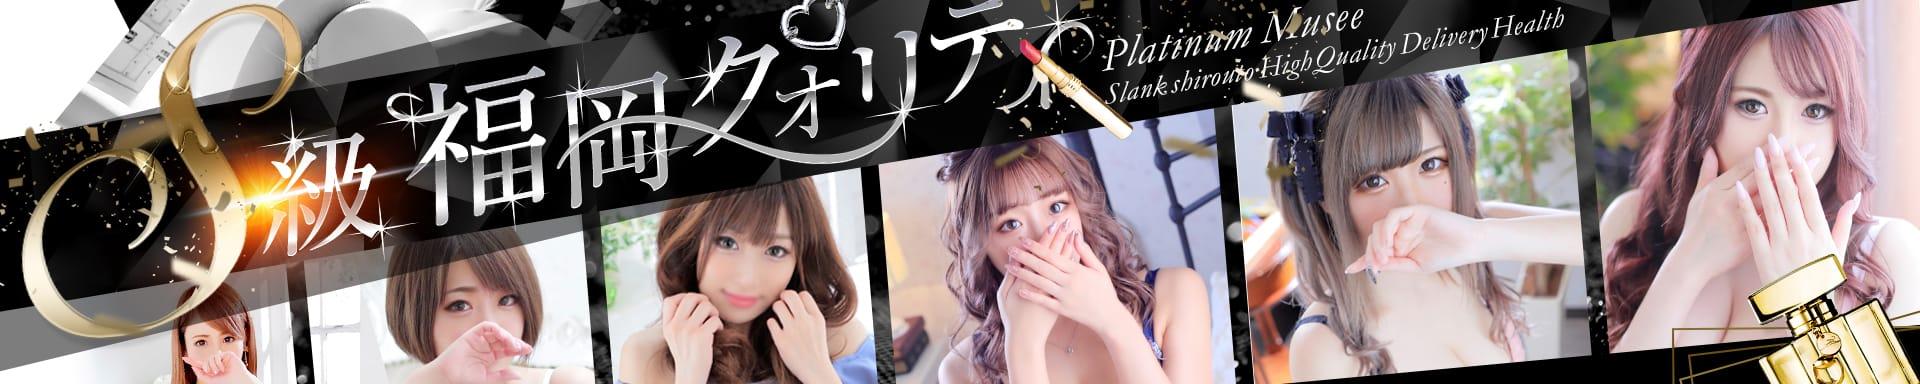 S級素人最高級デリバリーヘルス Platinum musee(プラチナムミュゼ) その3